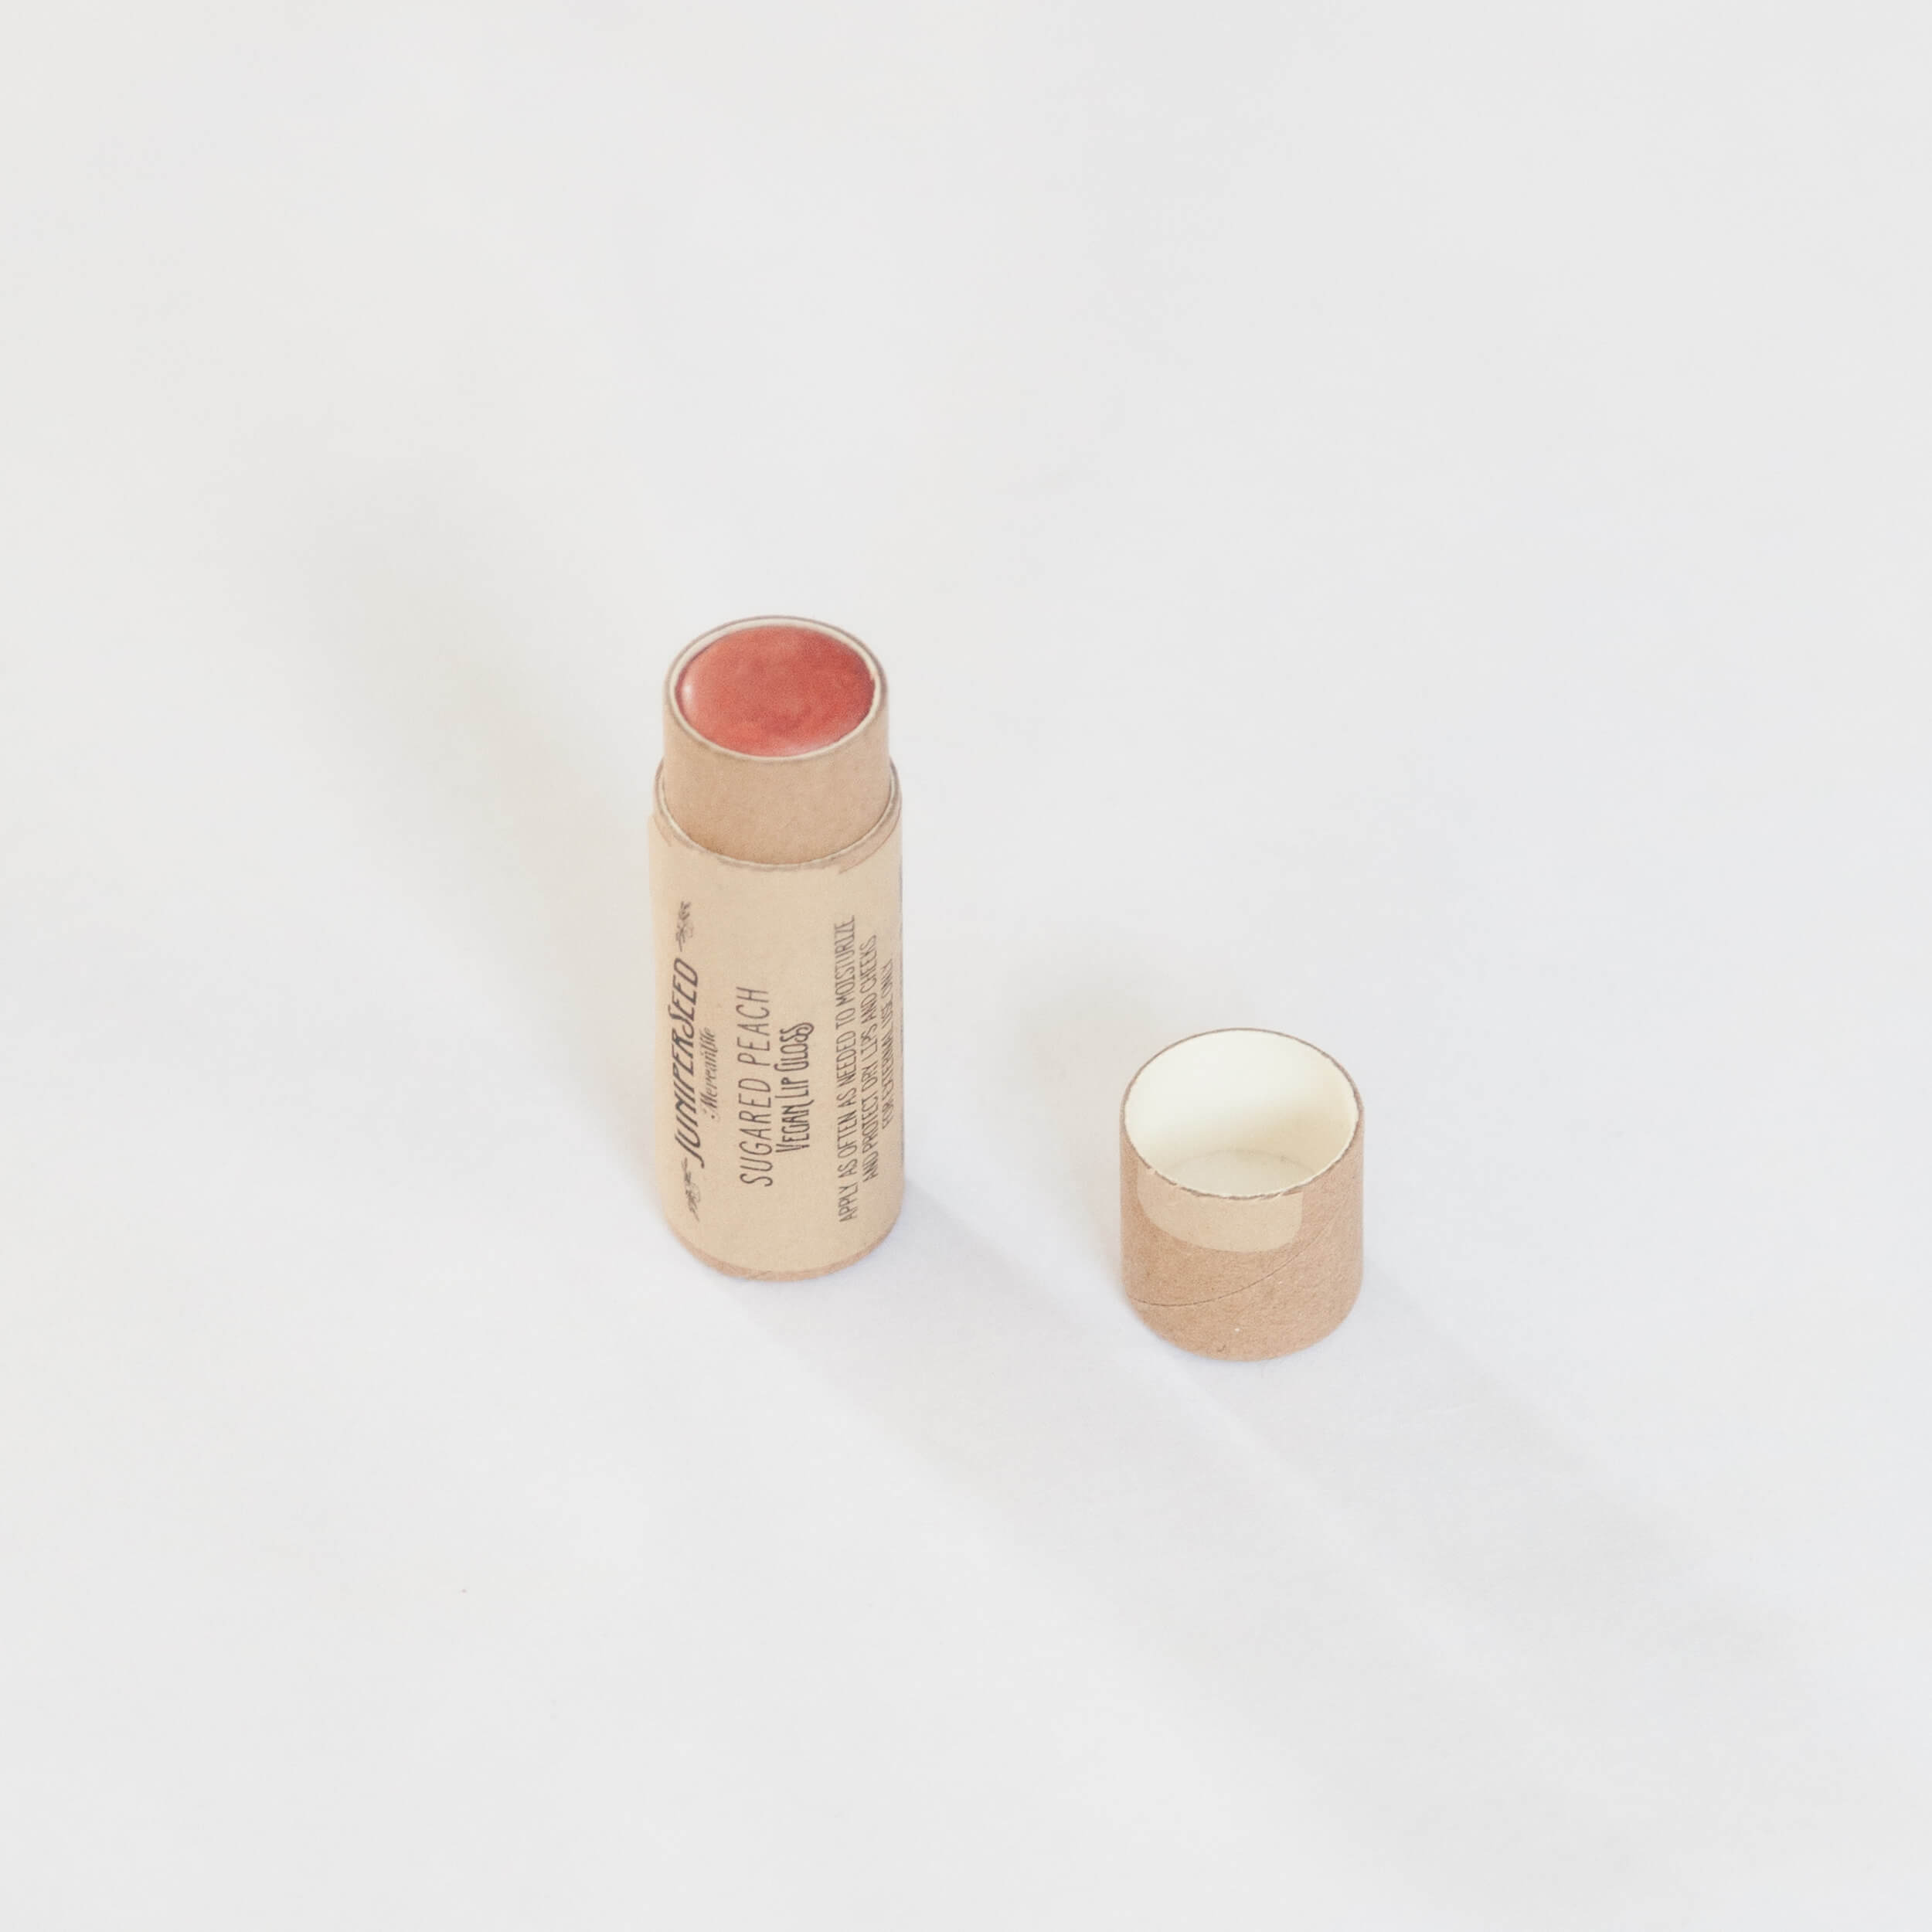 Juniperseed Mercantile Vegan Lip Balm